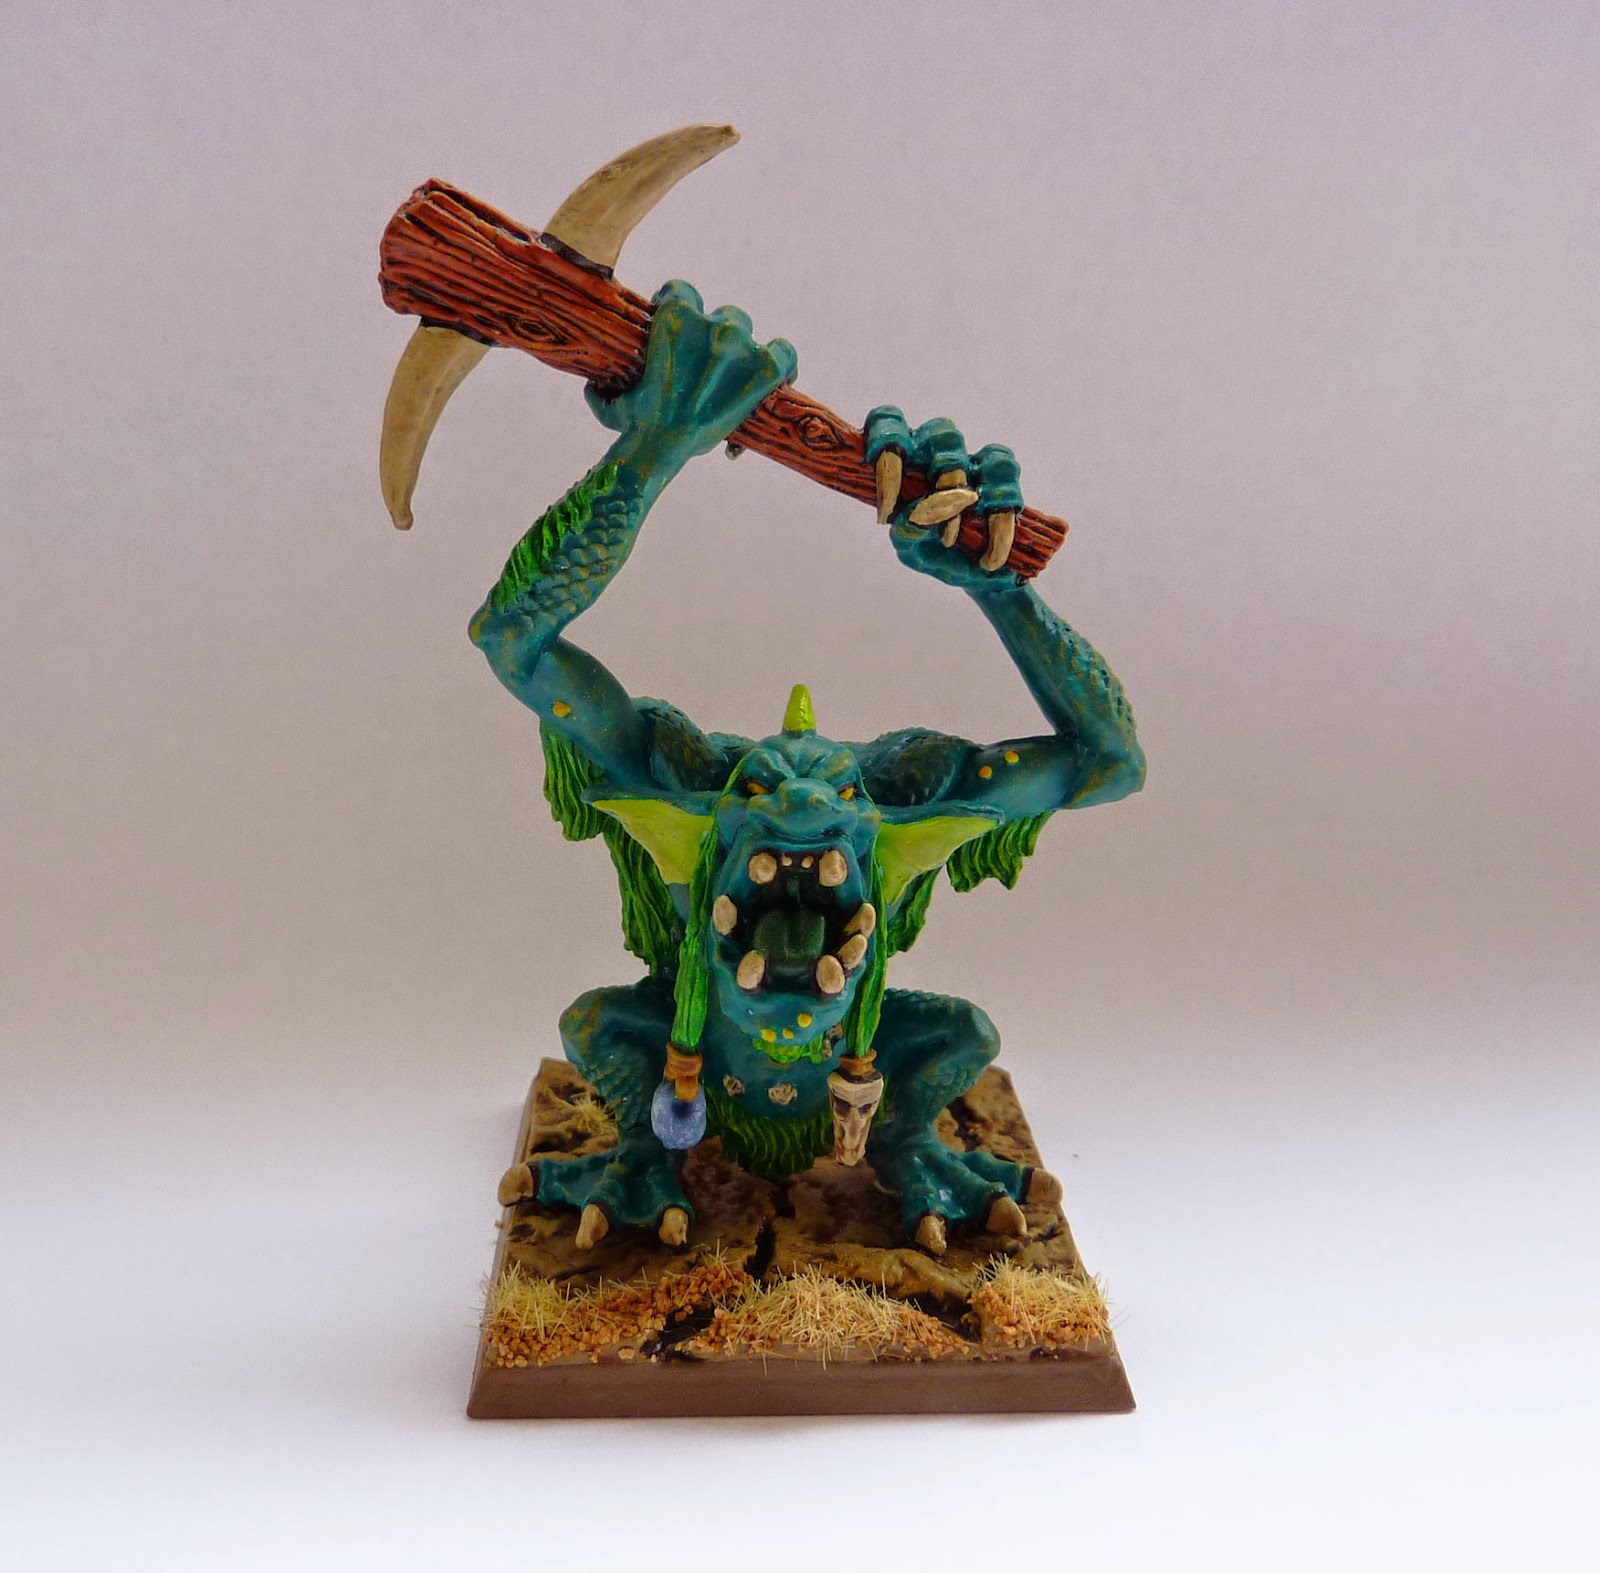 Classic Warhammer River Troll